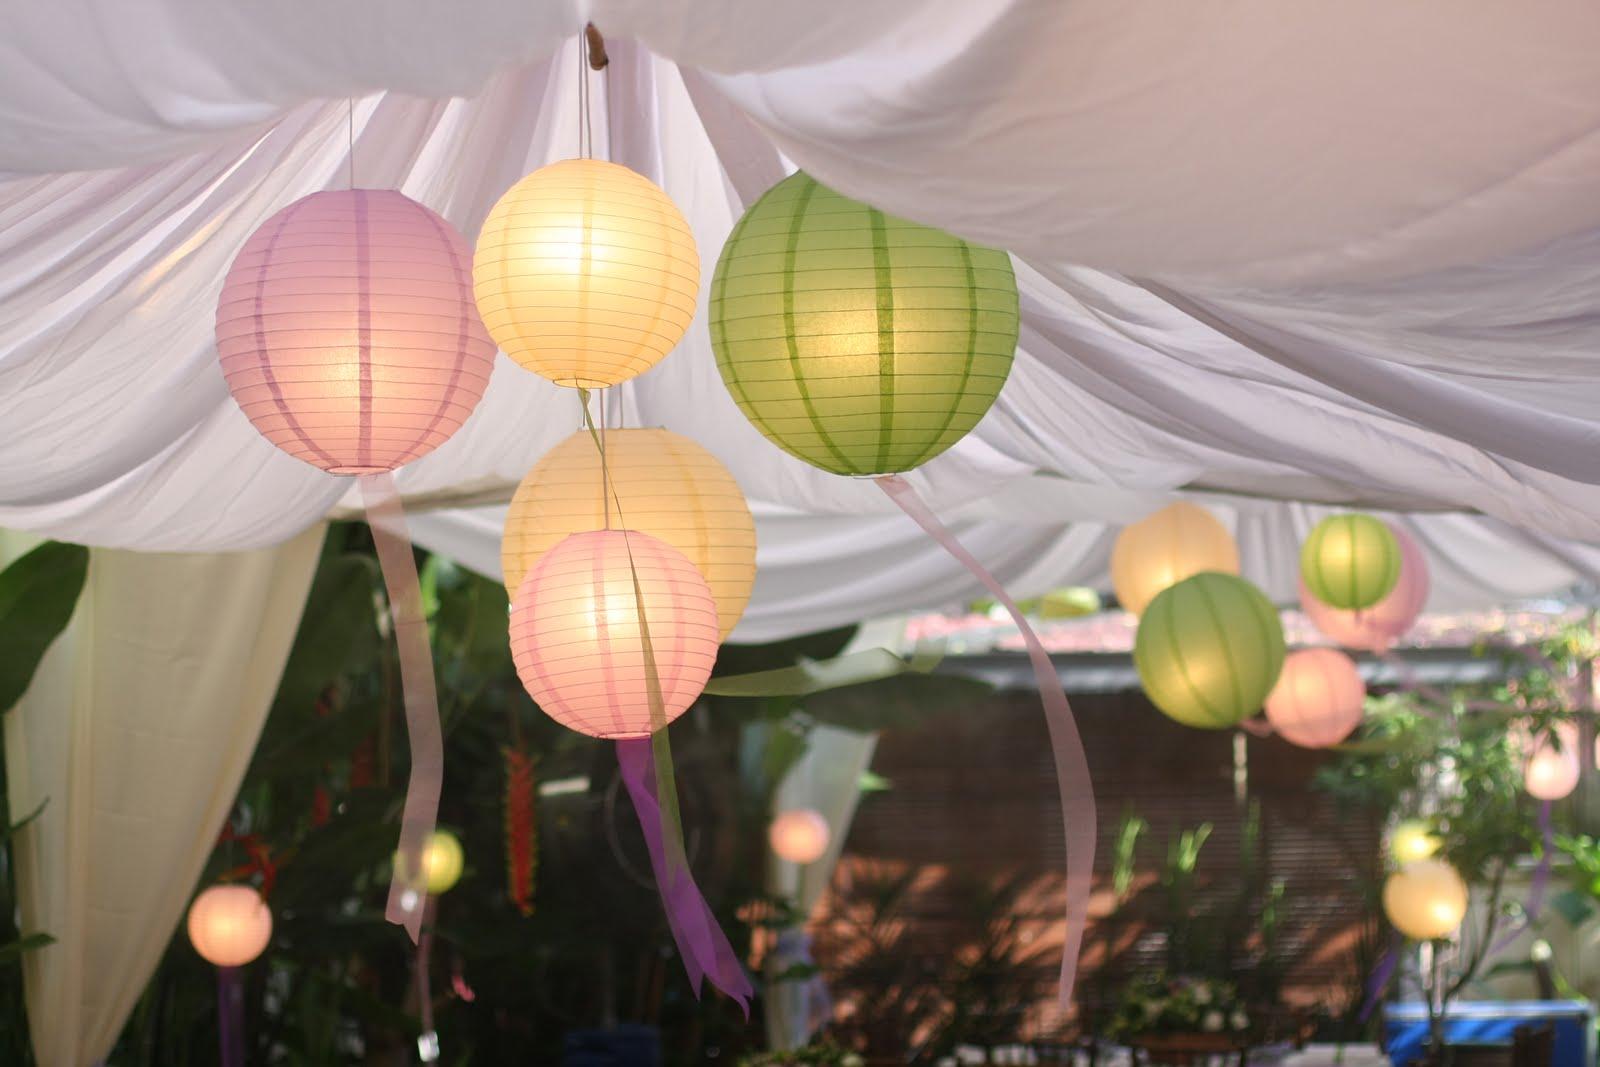 khareyan events paper lantern ideas. Black Bedroom Furniture Sets. Home Design Ideas